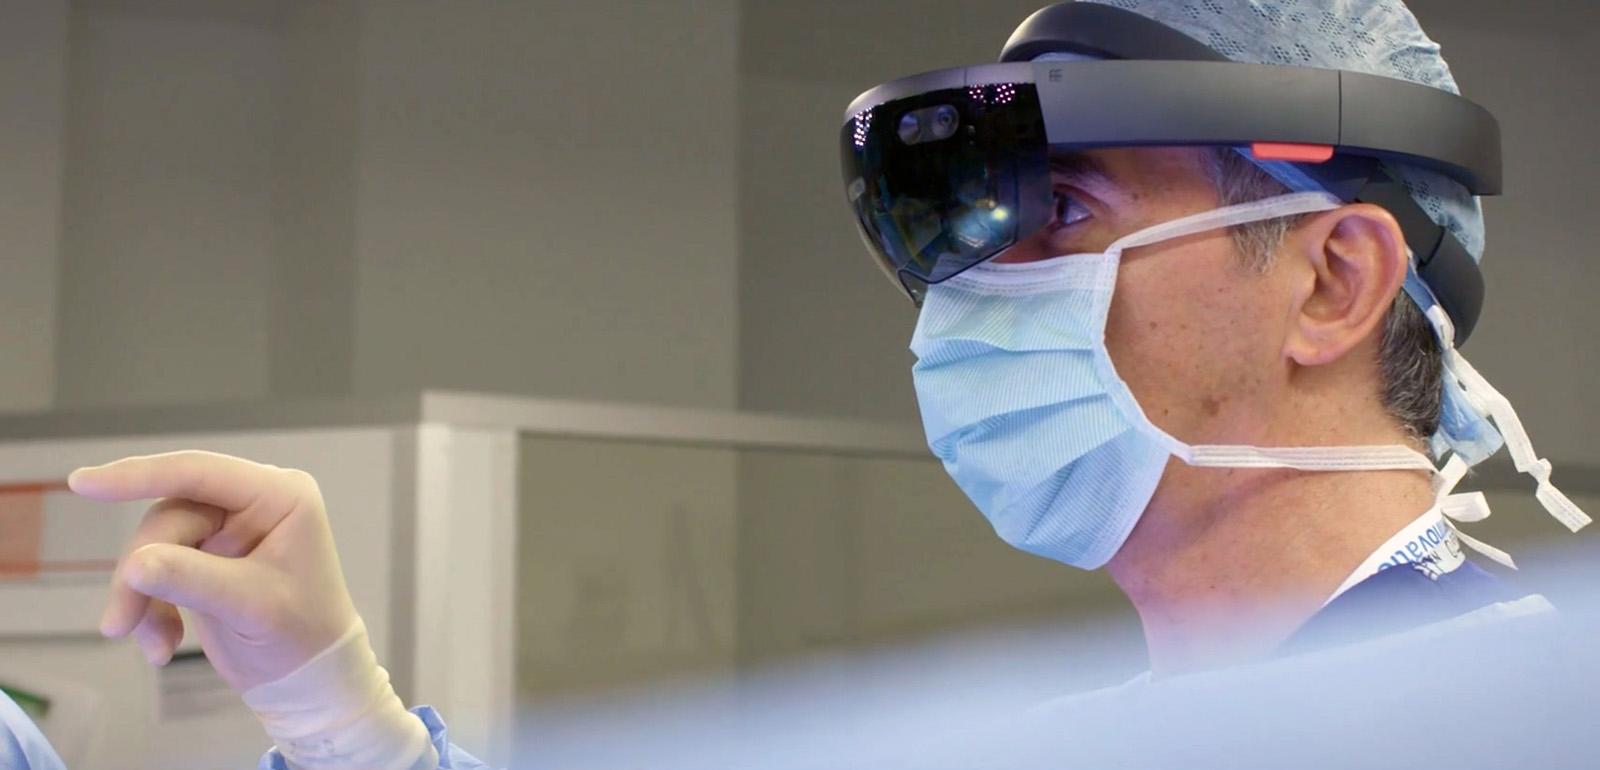 HoloLens will help a children's hospital perform critical surgeries | DeviceDaily.com